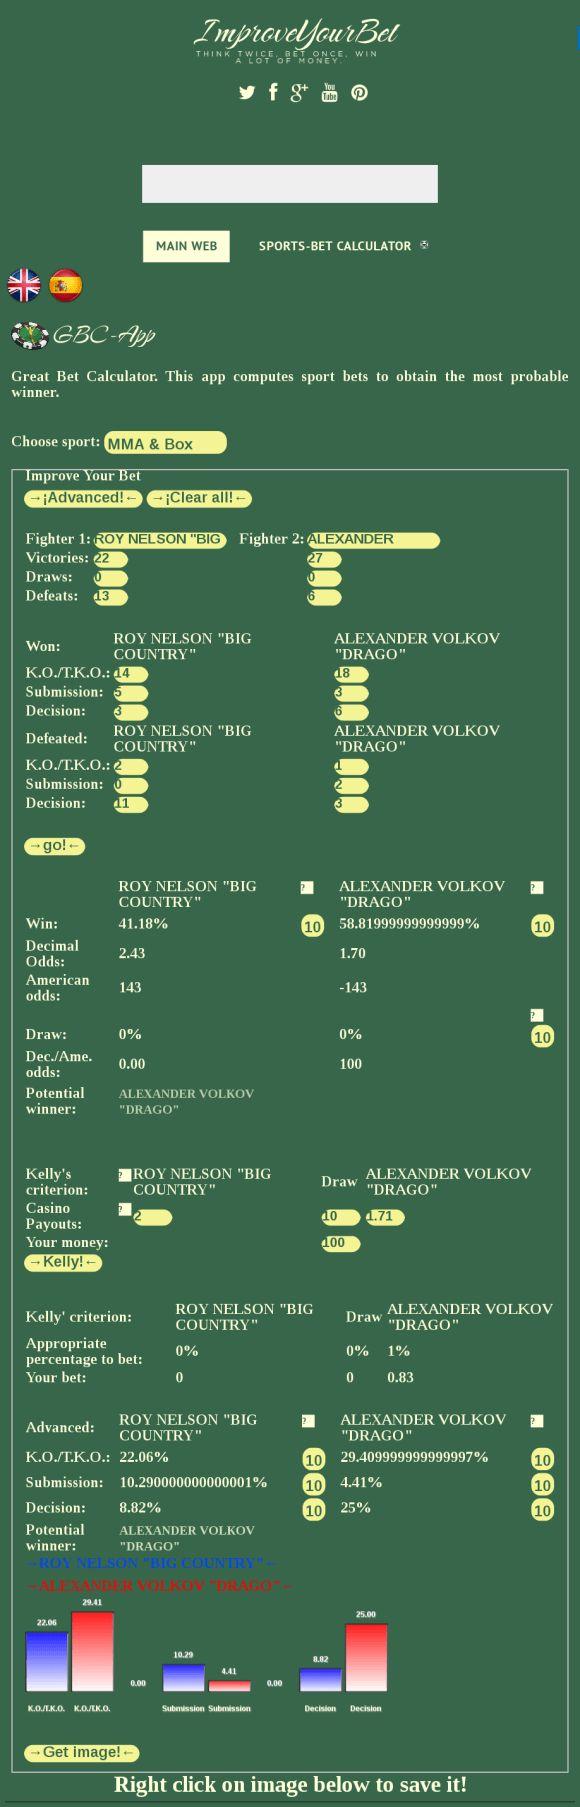 UFC on fox 24 forecast predictions and picks ROY NELSON BIG COUNTRY Vs ALEXANDER VOLKOV DRAGO